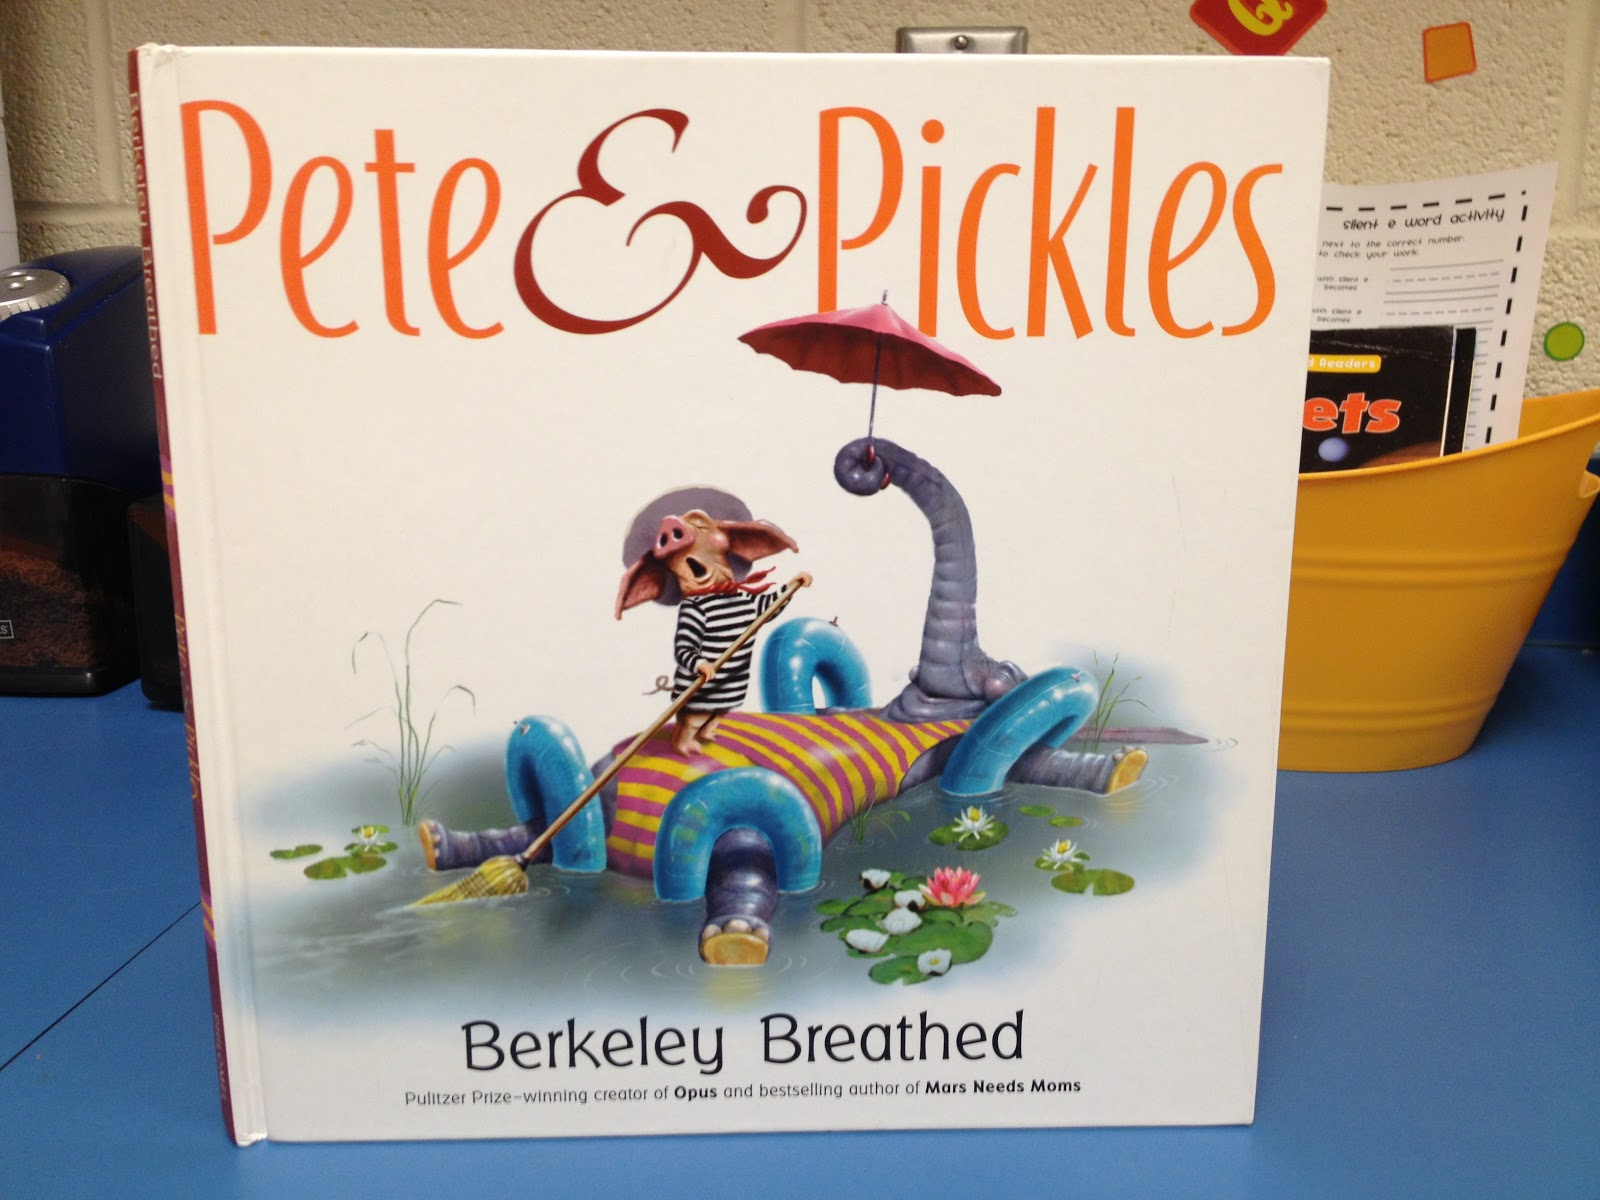 Fourth Grade Teacher Lady Top 10 Favorite Books